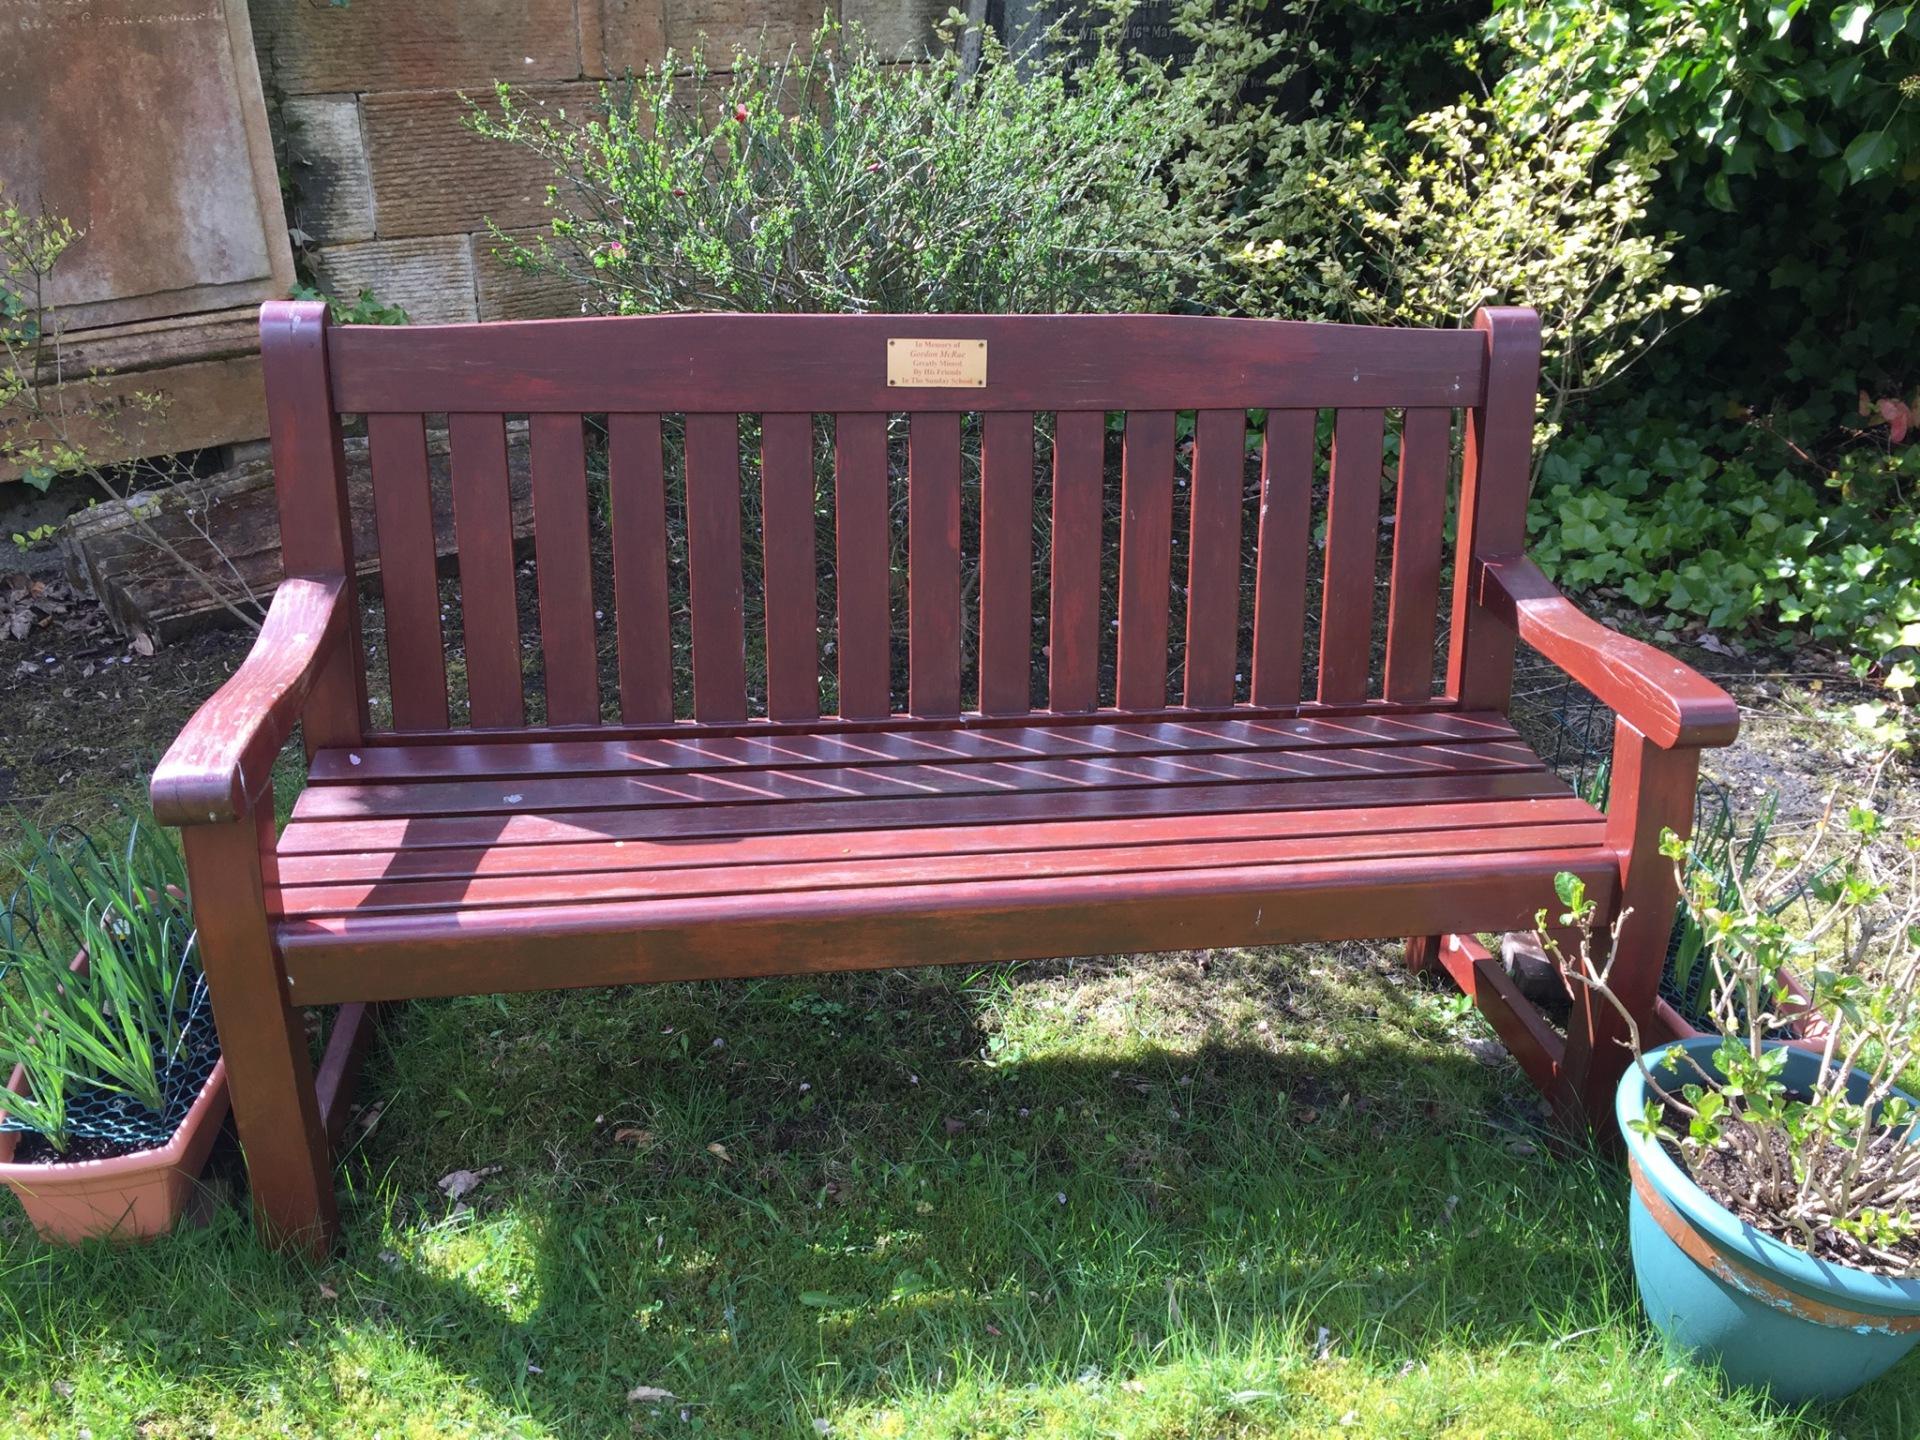 Bench in memory of Gordon McRae